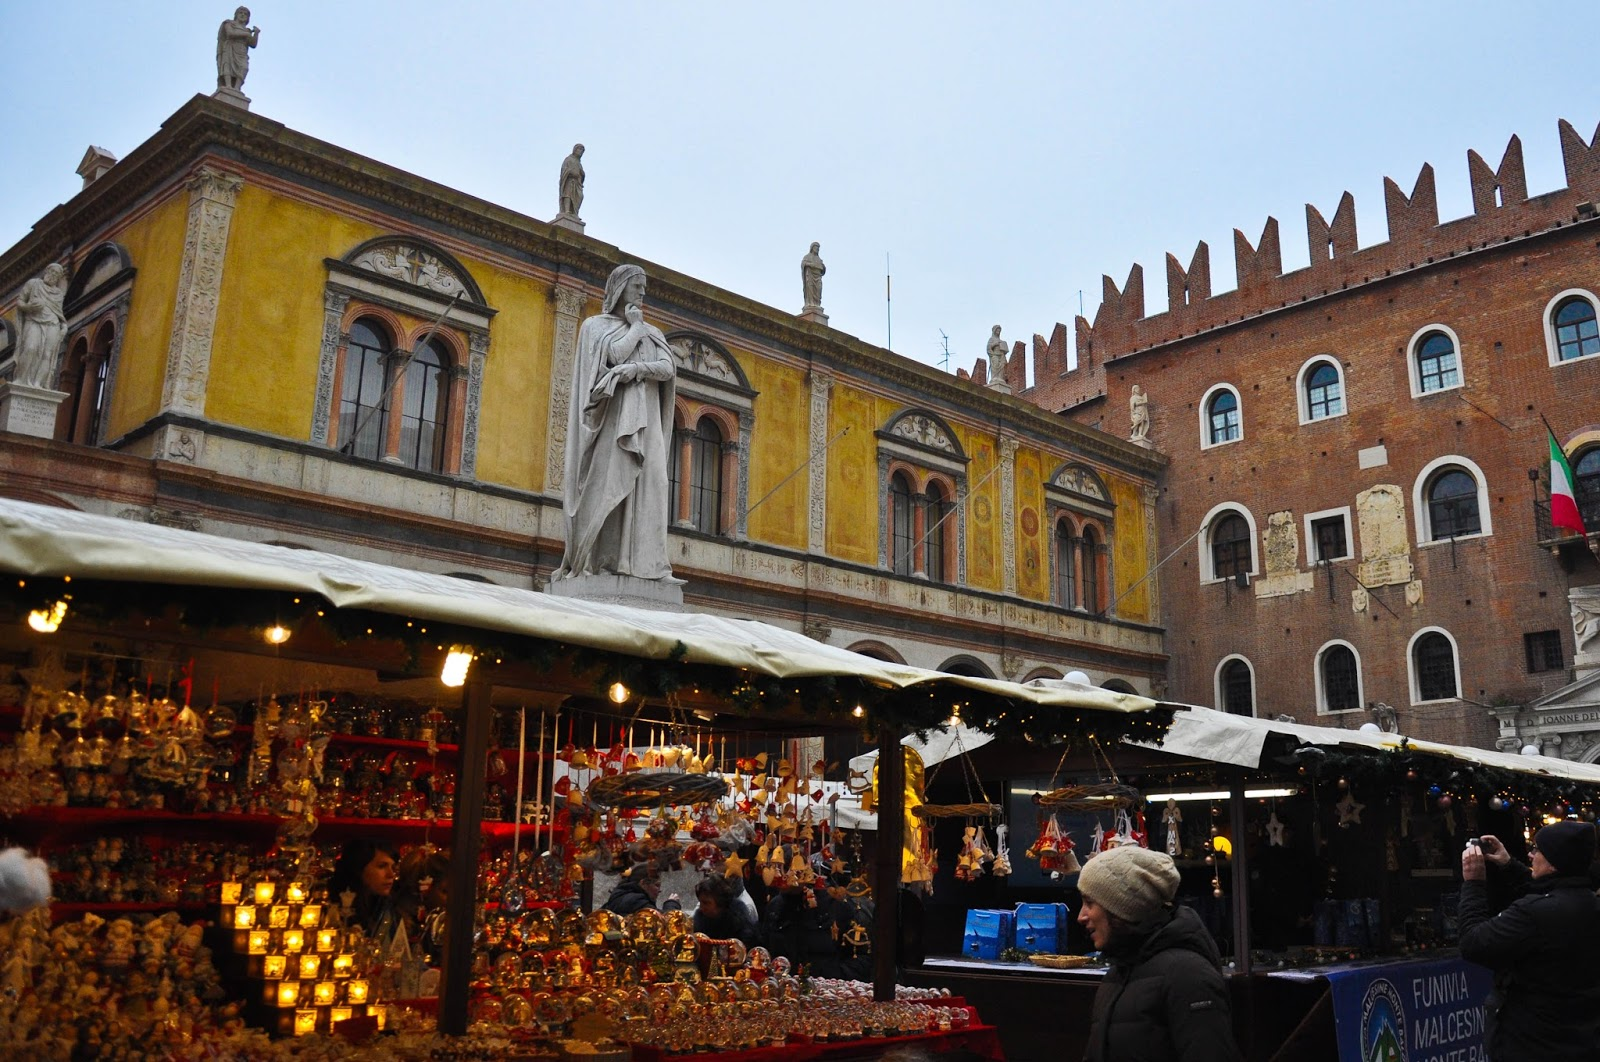 Christmas shopping, Nuremberg Christmas market, Verona, Italy